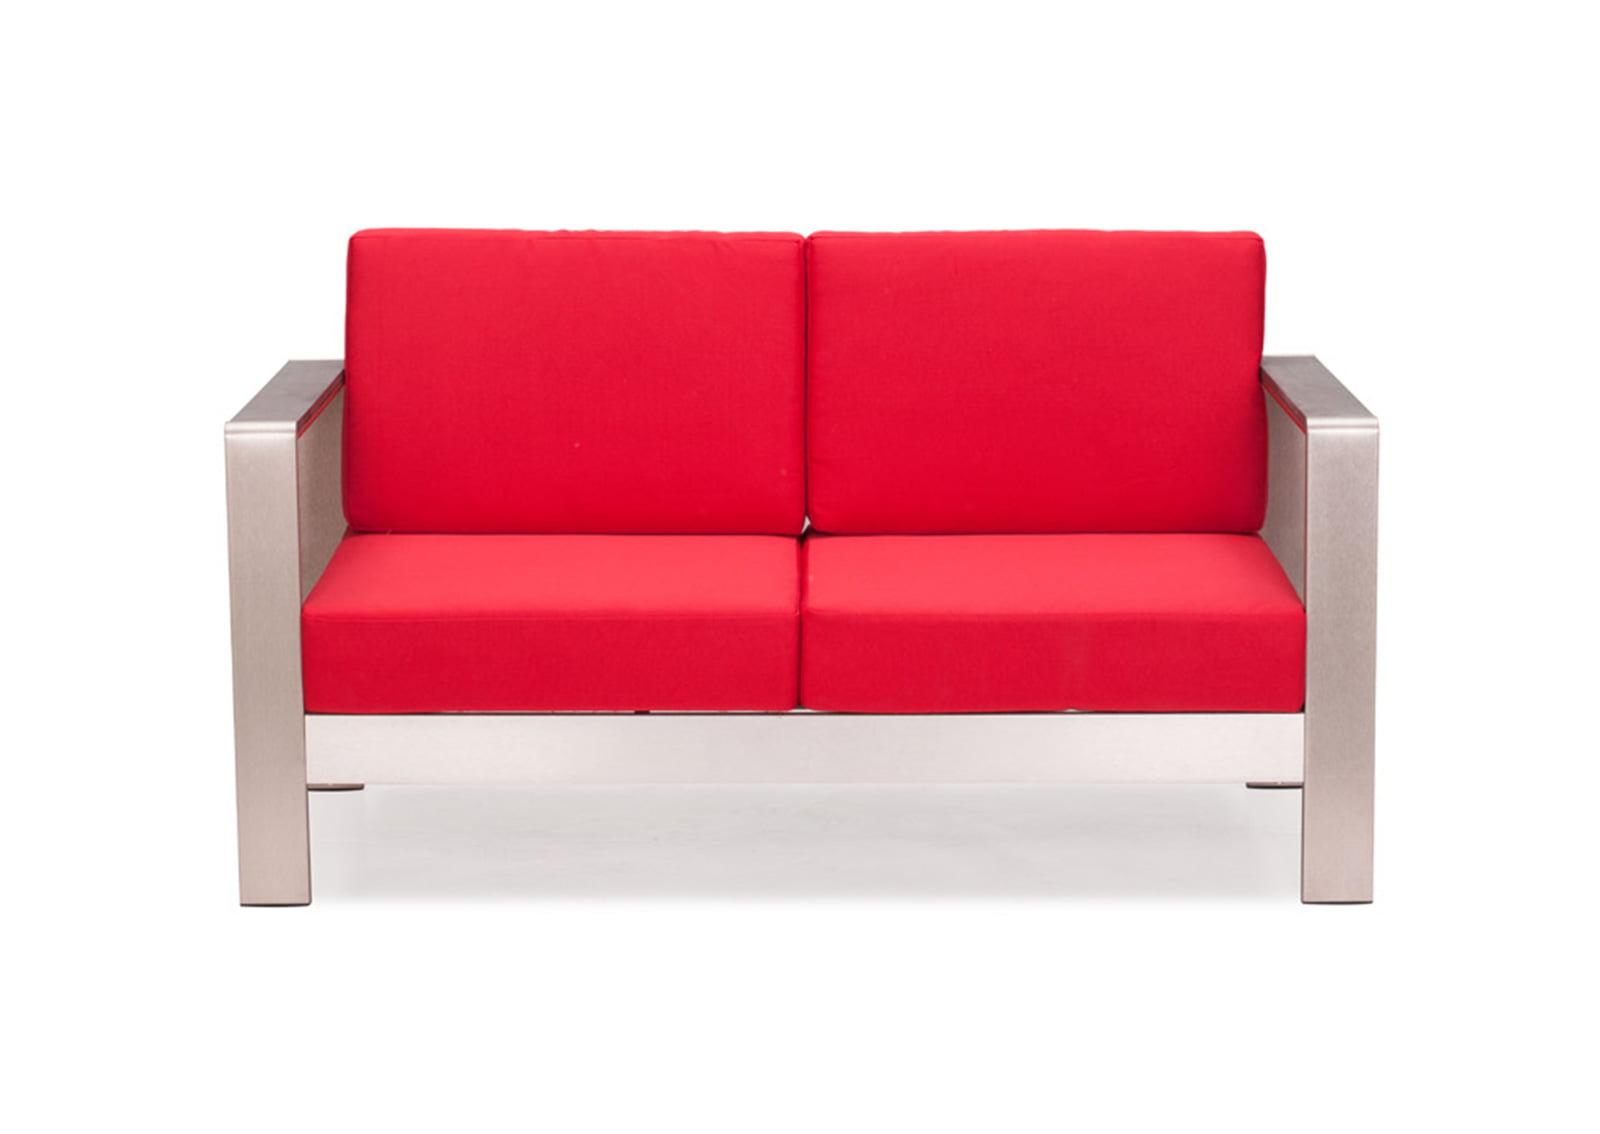 cosmo sofa sectional connectors uk cosmopolitan cushions red furnishplus